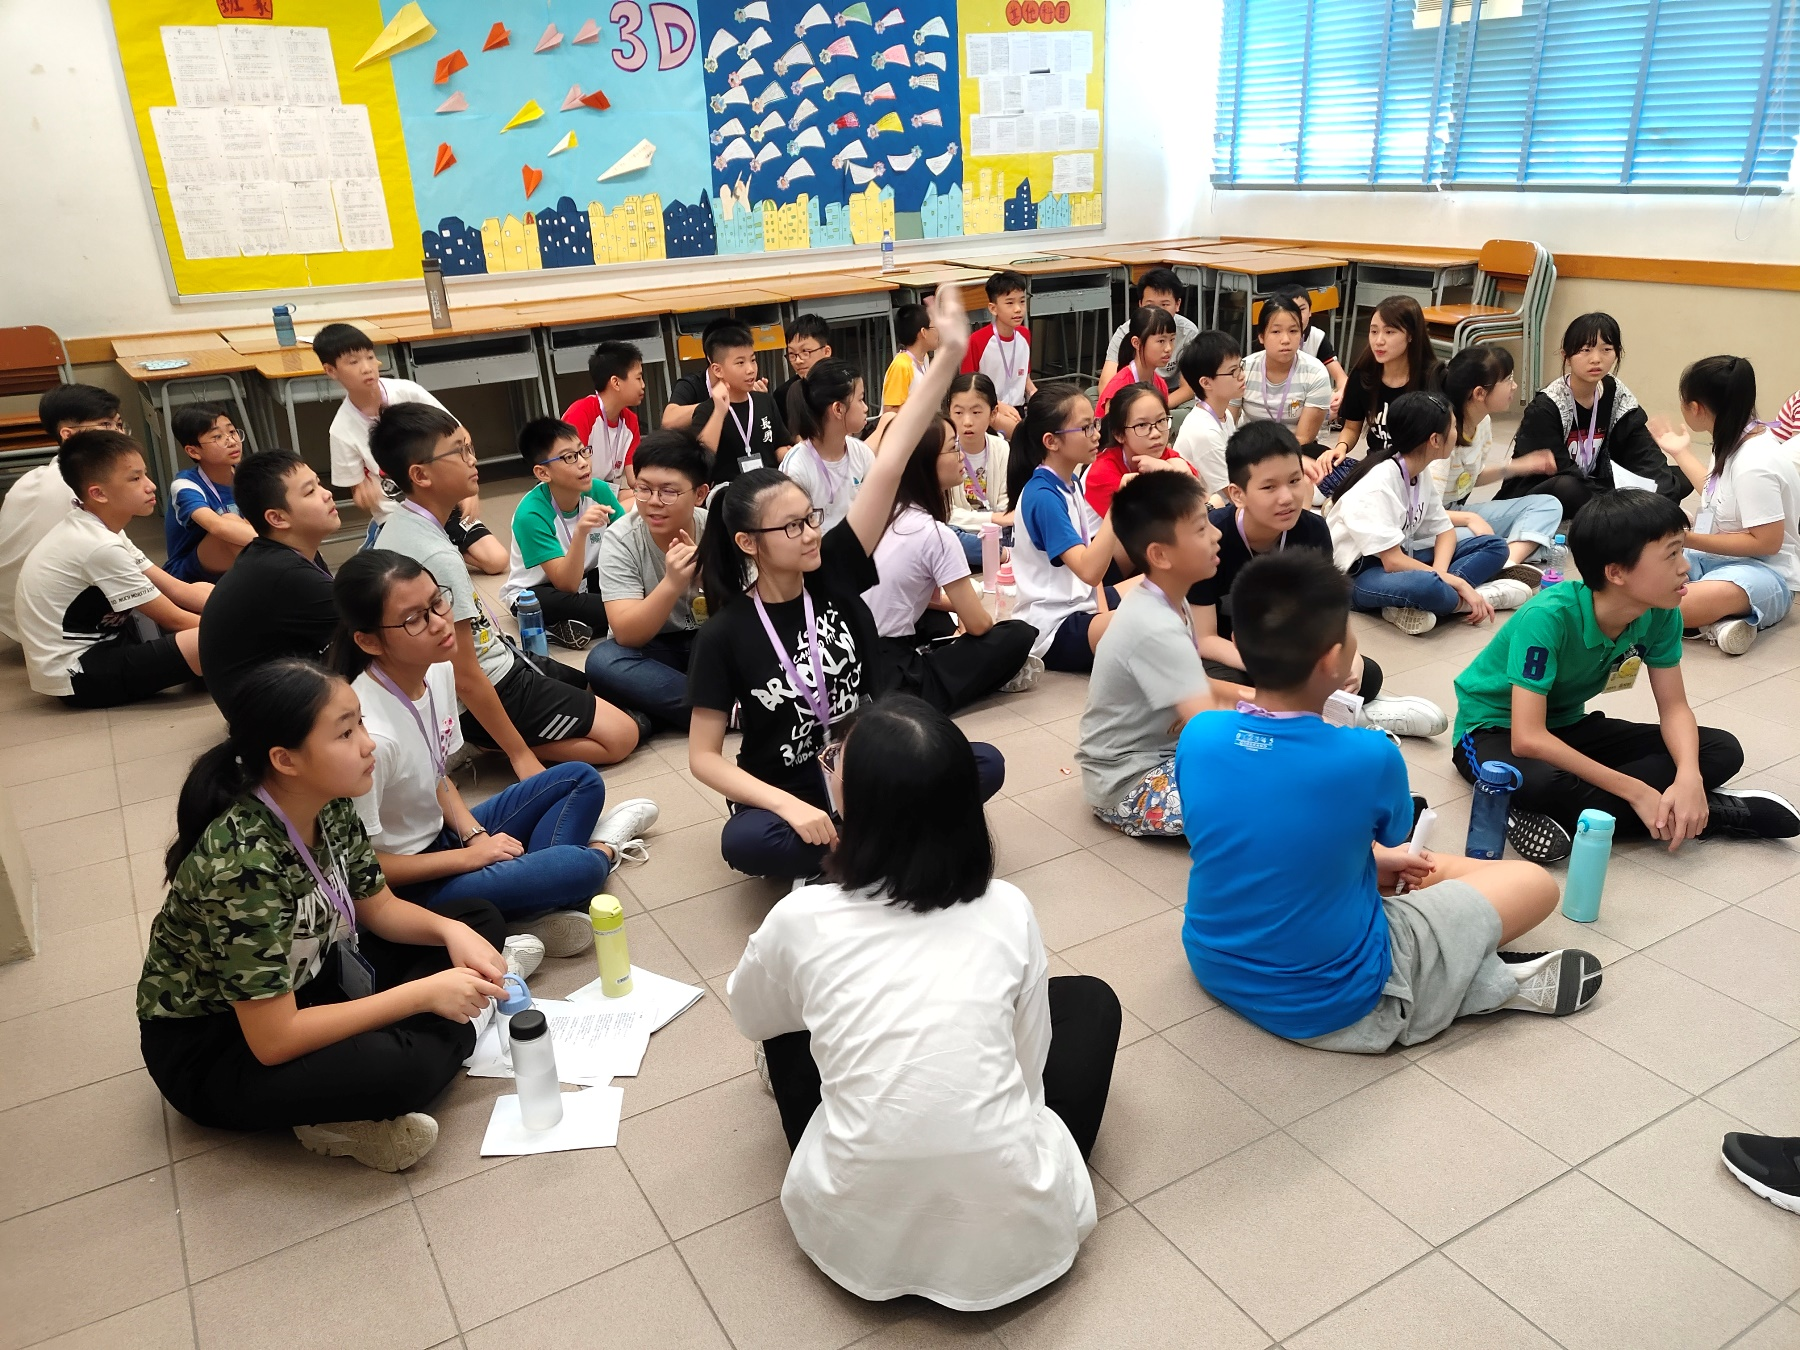 http://npc.edu.hk/sites/default/files/img_20190813_120823.jpg